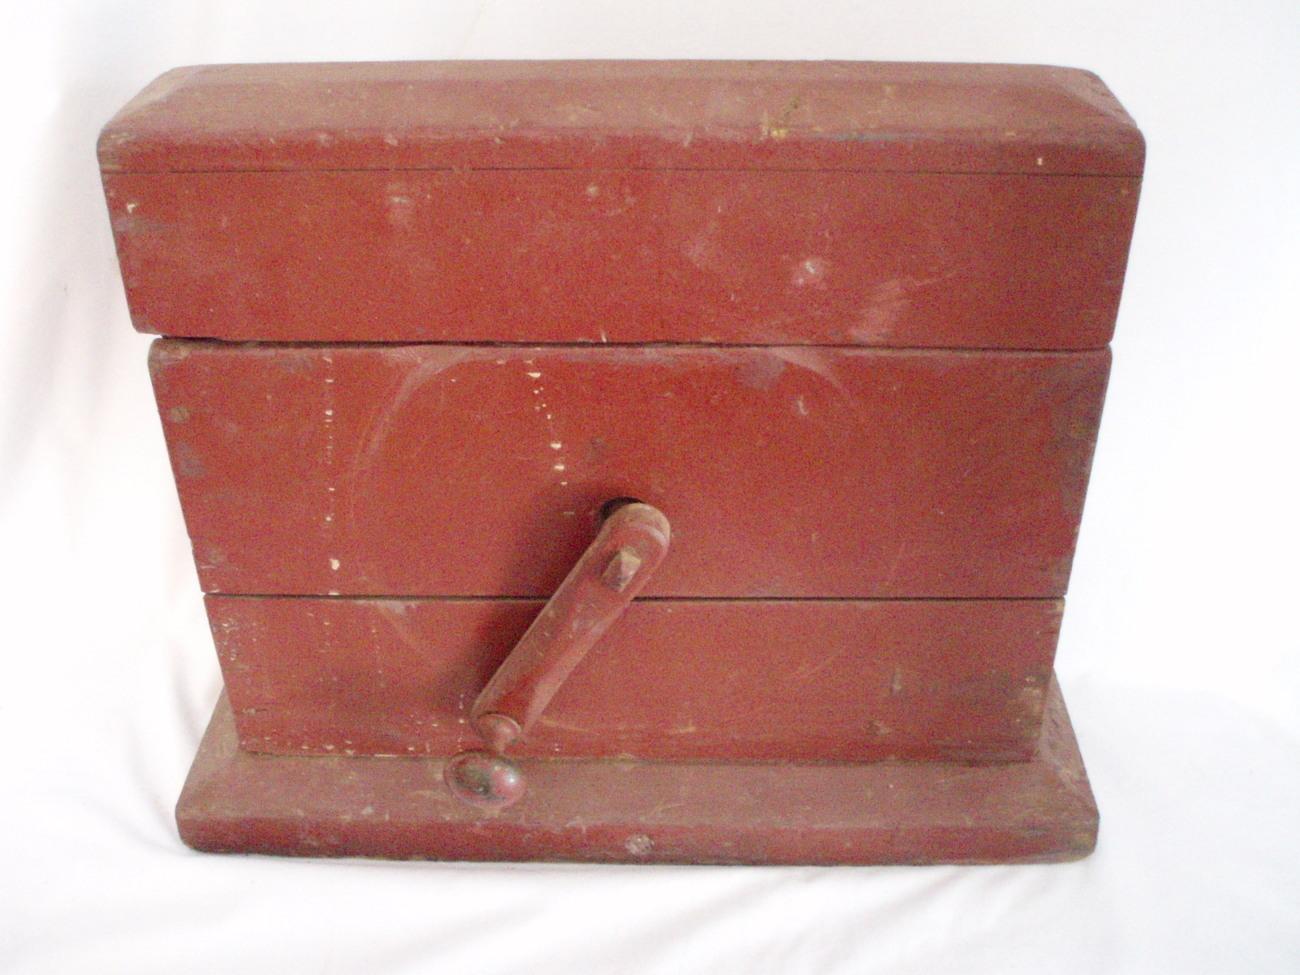 Image 1 of Primitive Grindstone hand cranked wood box Antique Tool